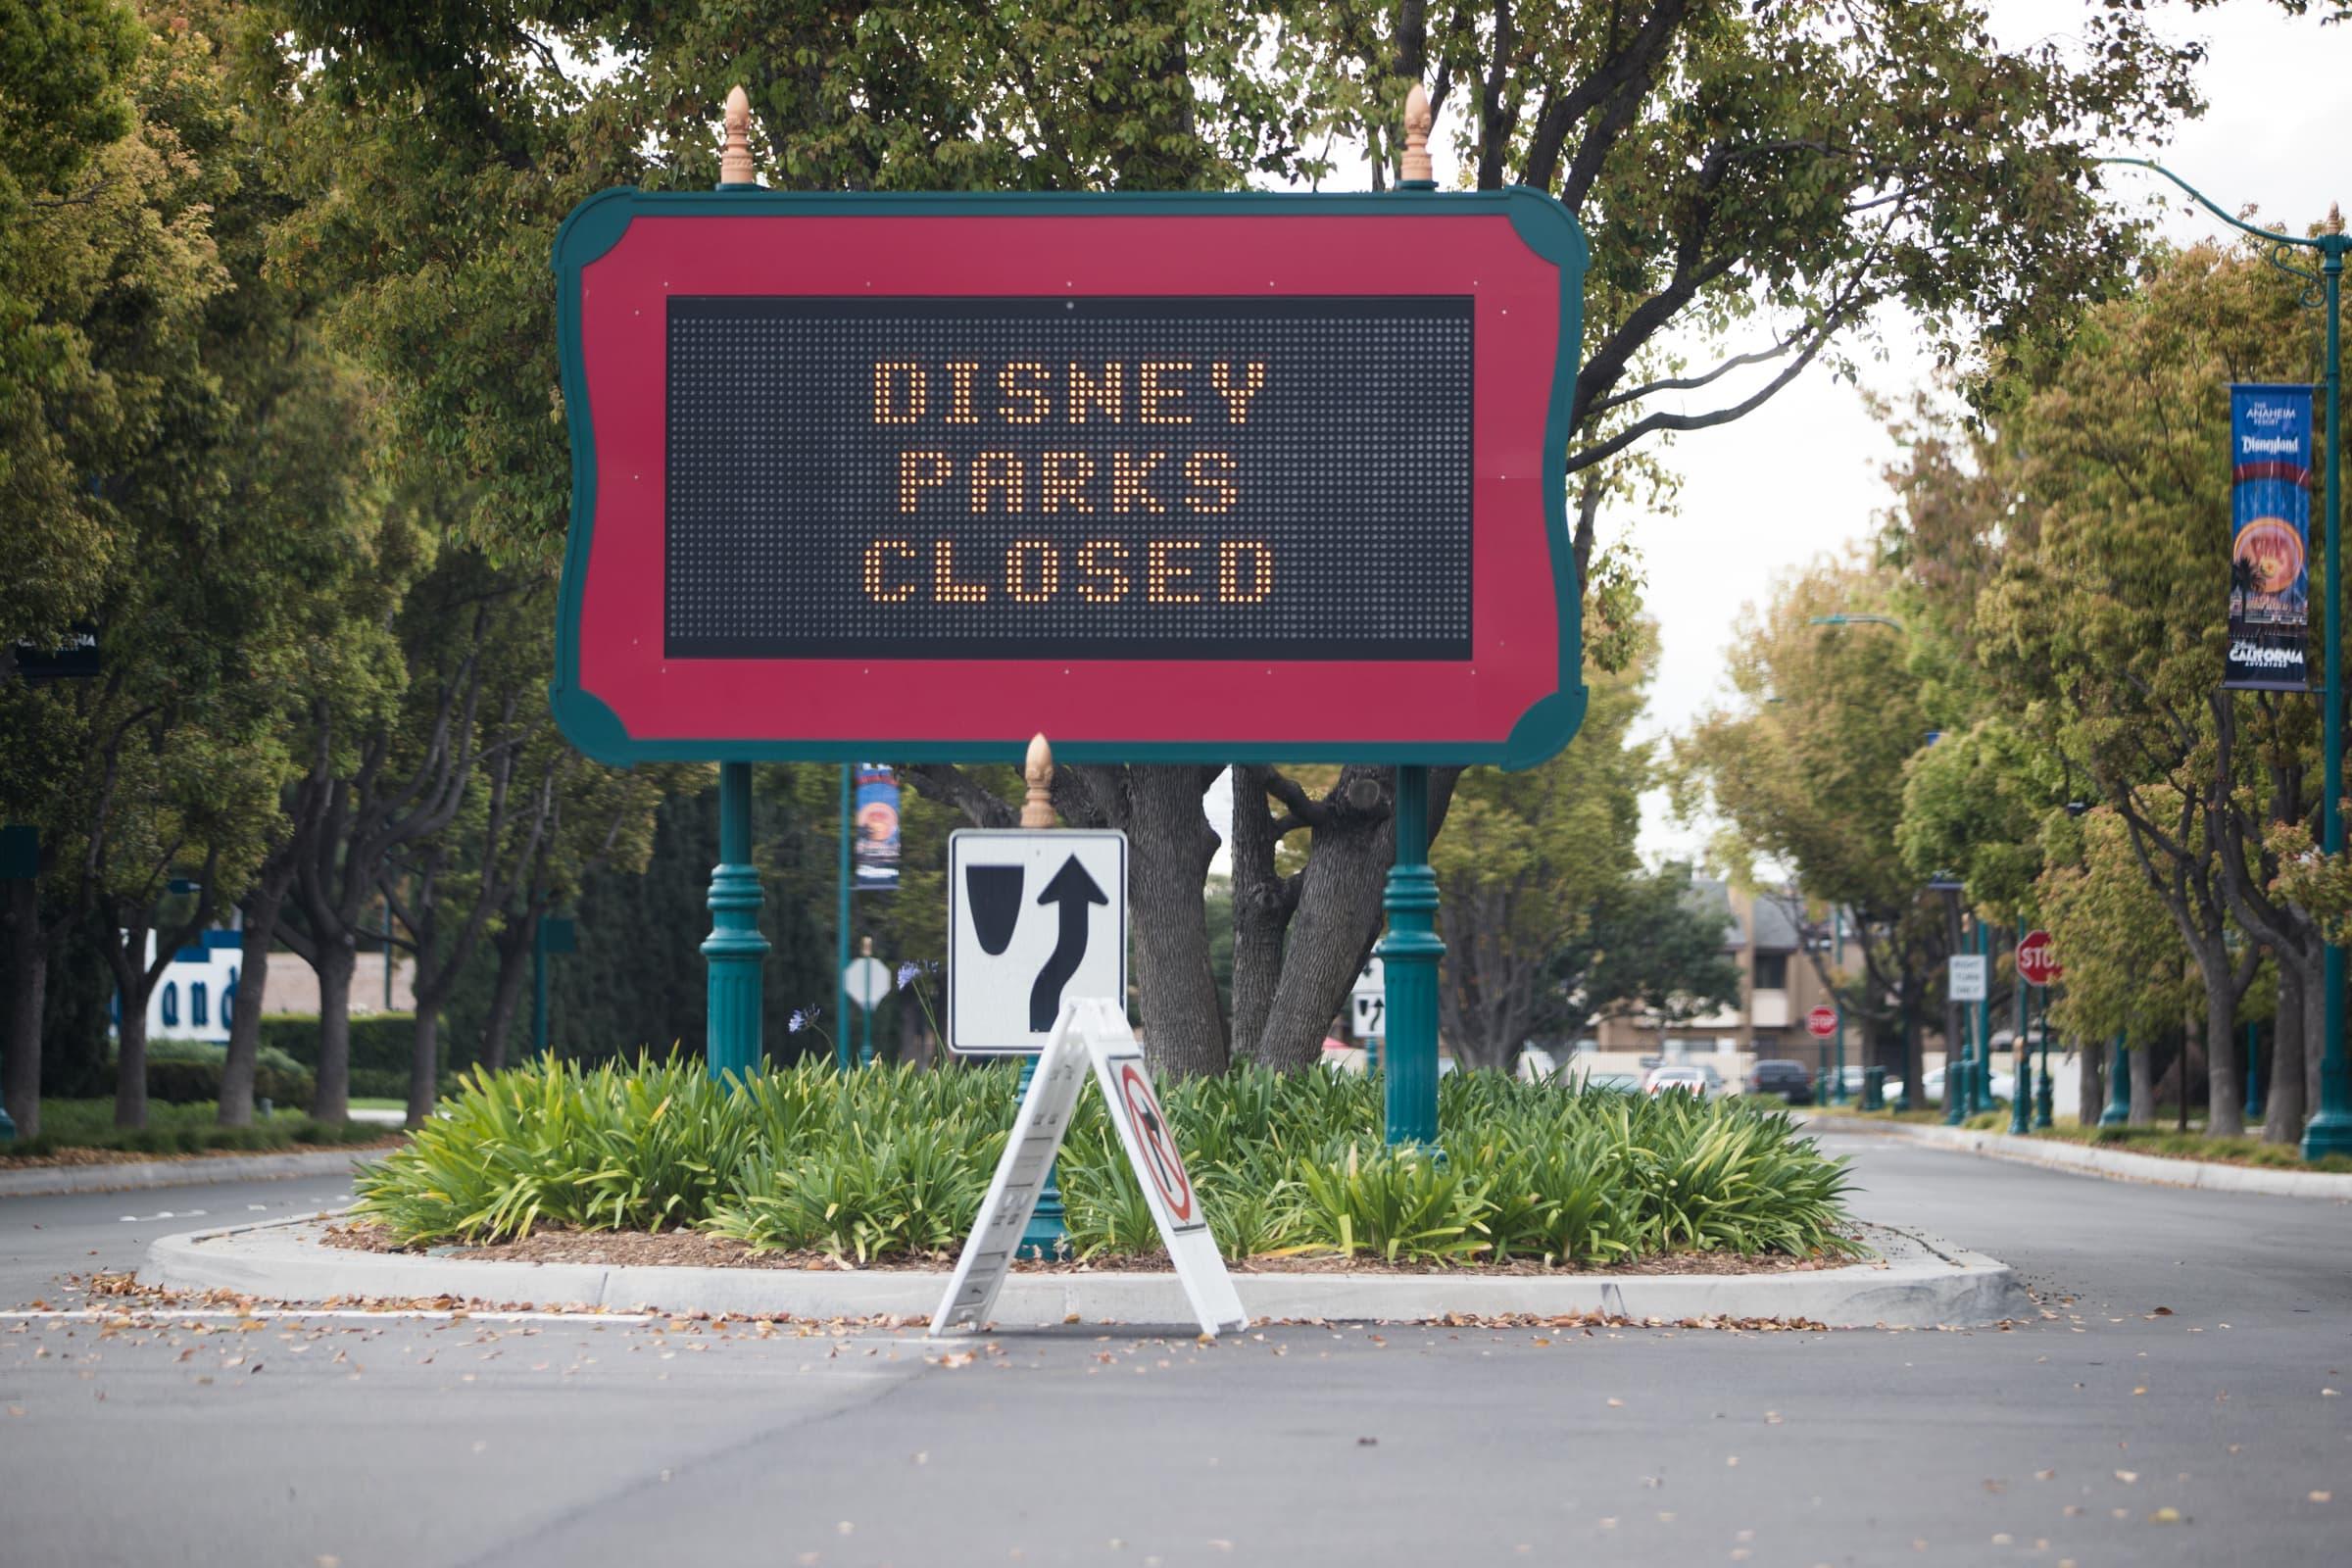 Theme park and cruise shut down cost Disney $1 billion